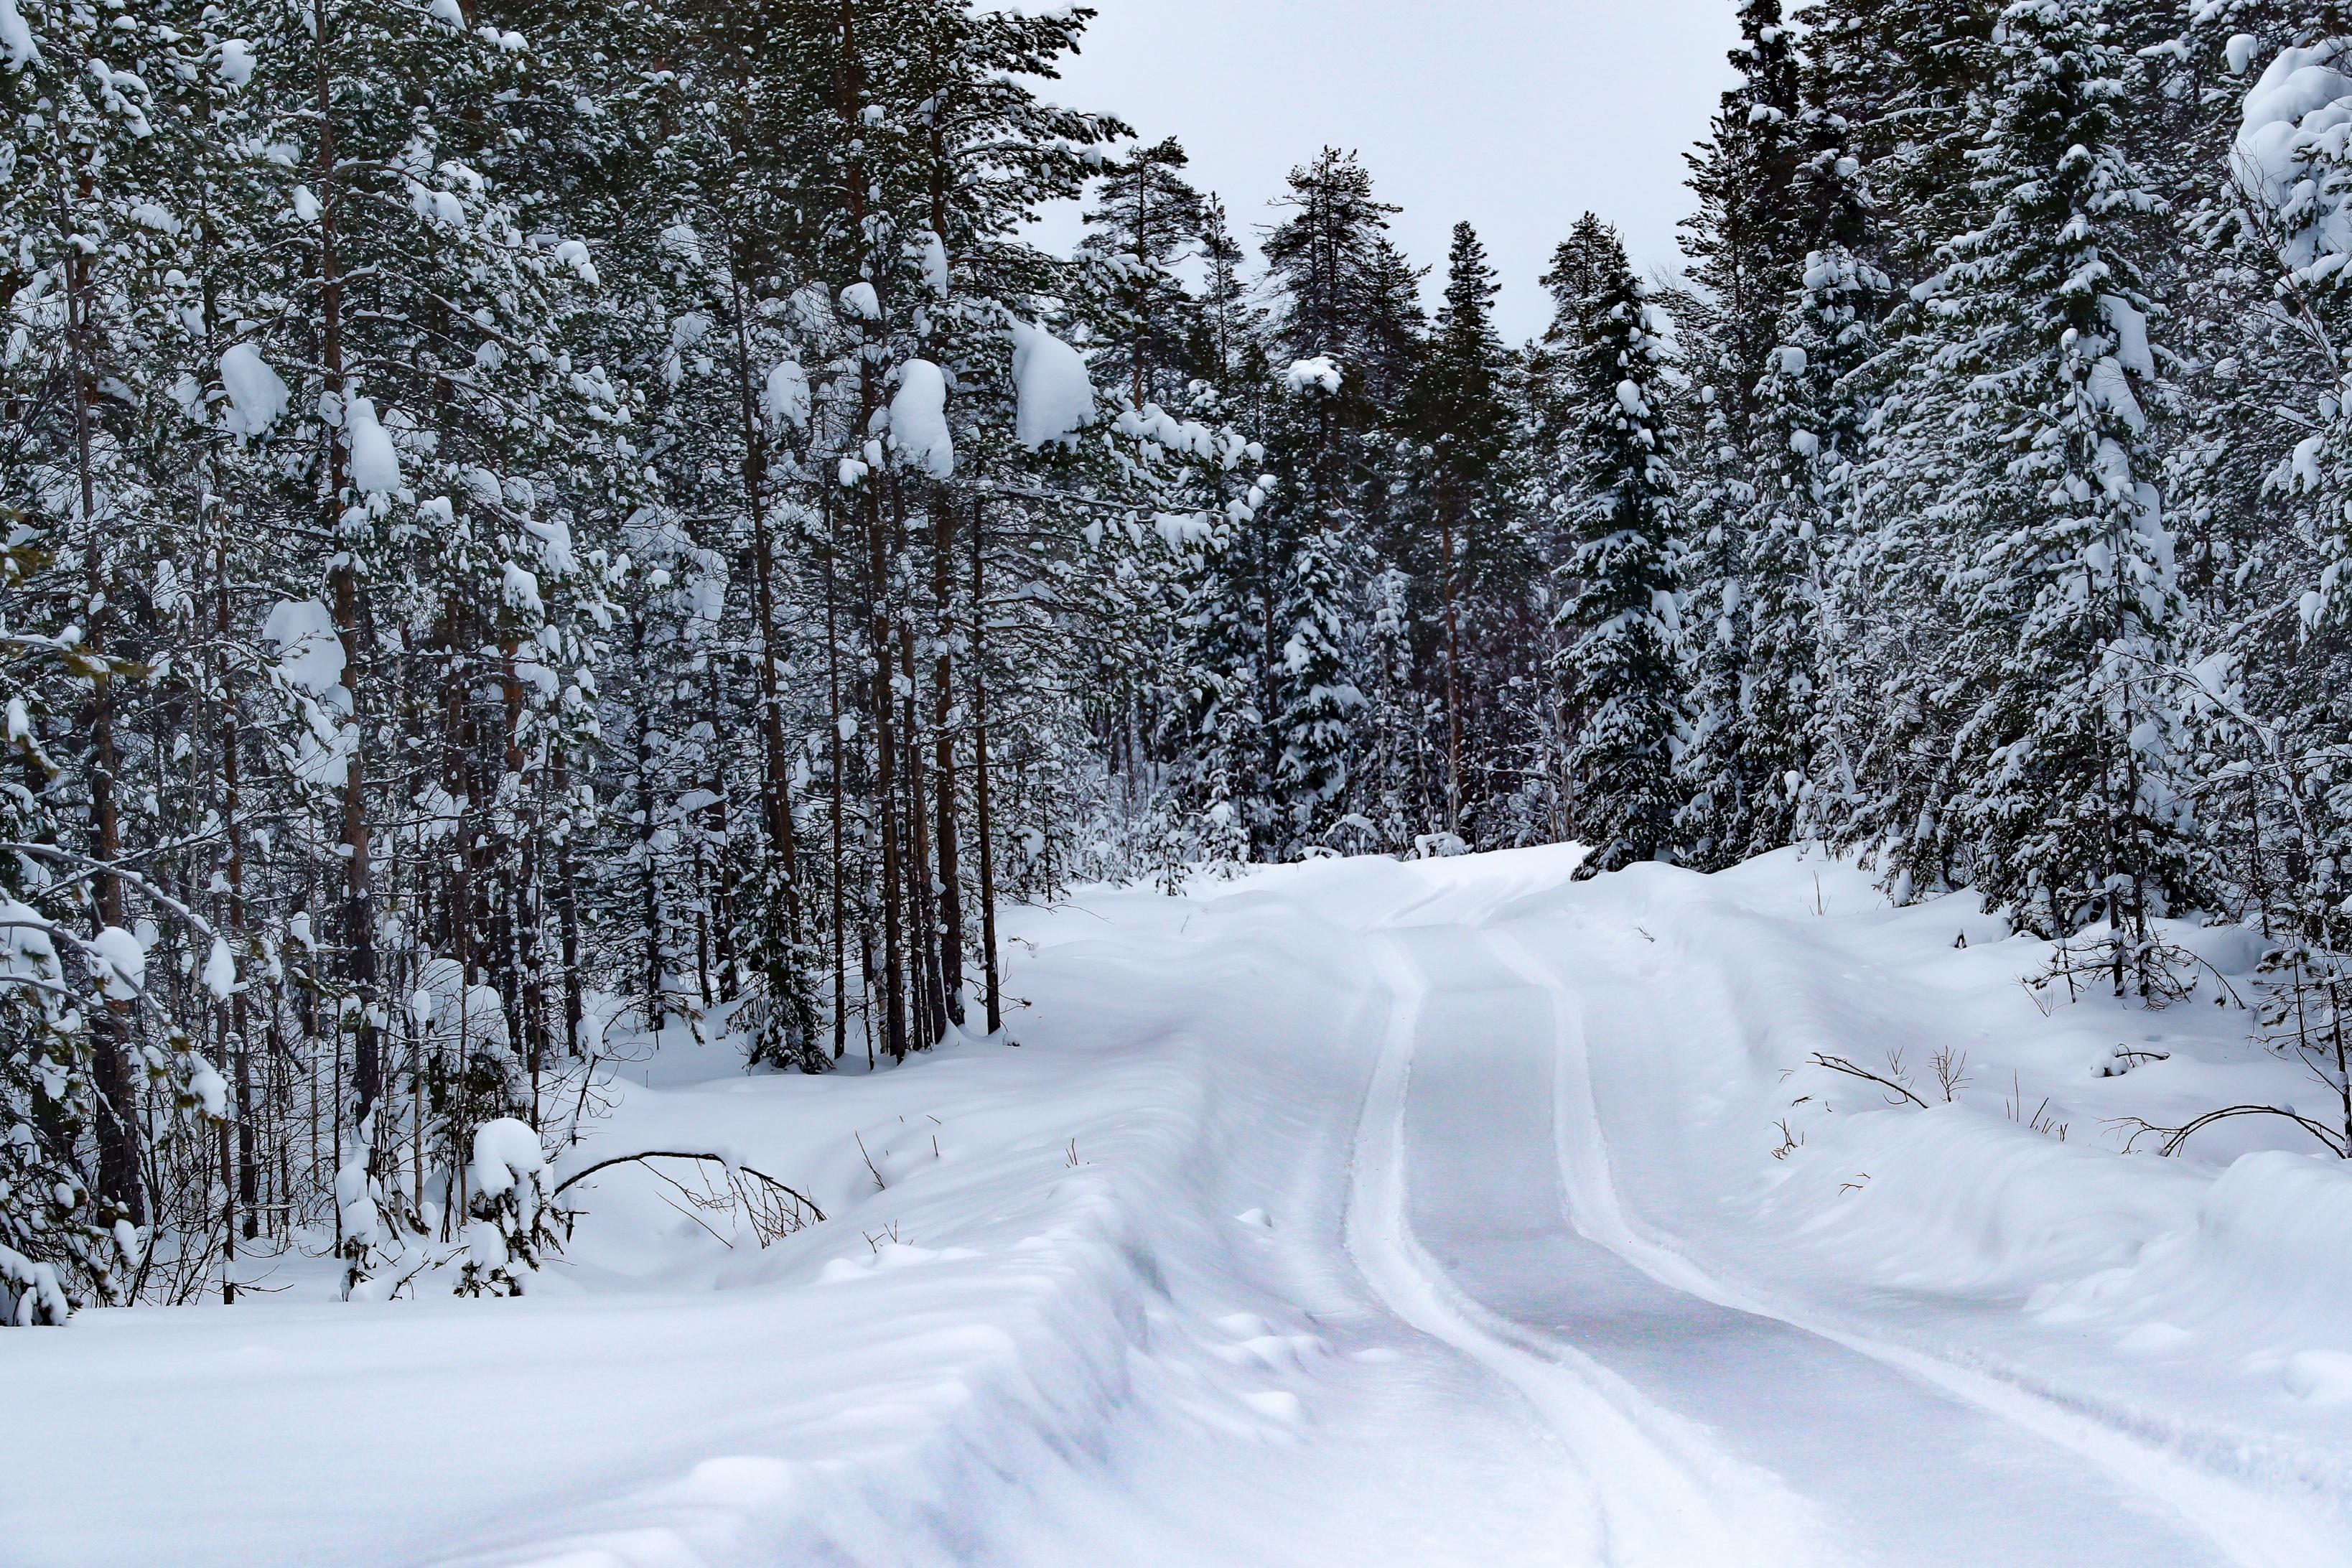 WRC: Arctic Rally Finland - Powered by CapitalBox [26-28 Febrero] Eu2NieaWYAY6MsM?format=jpg&name=4096x4096